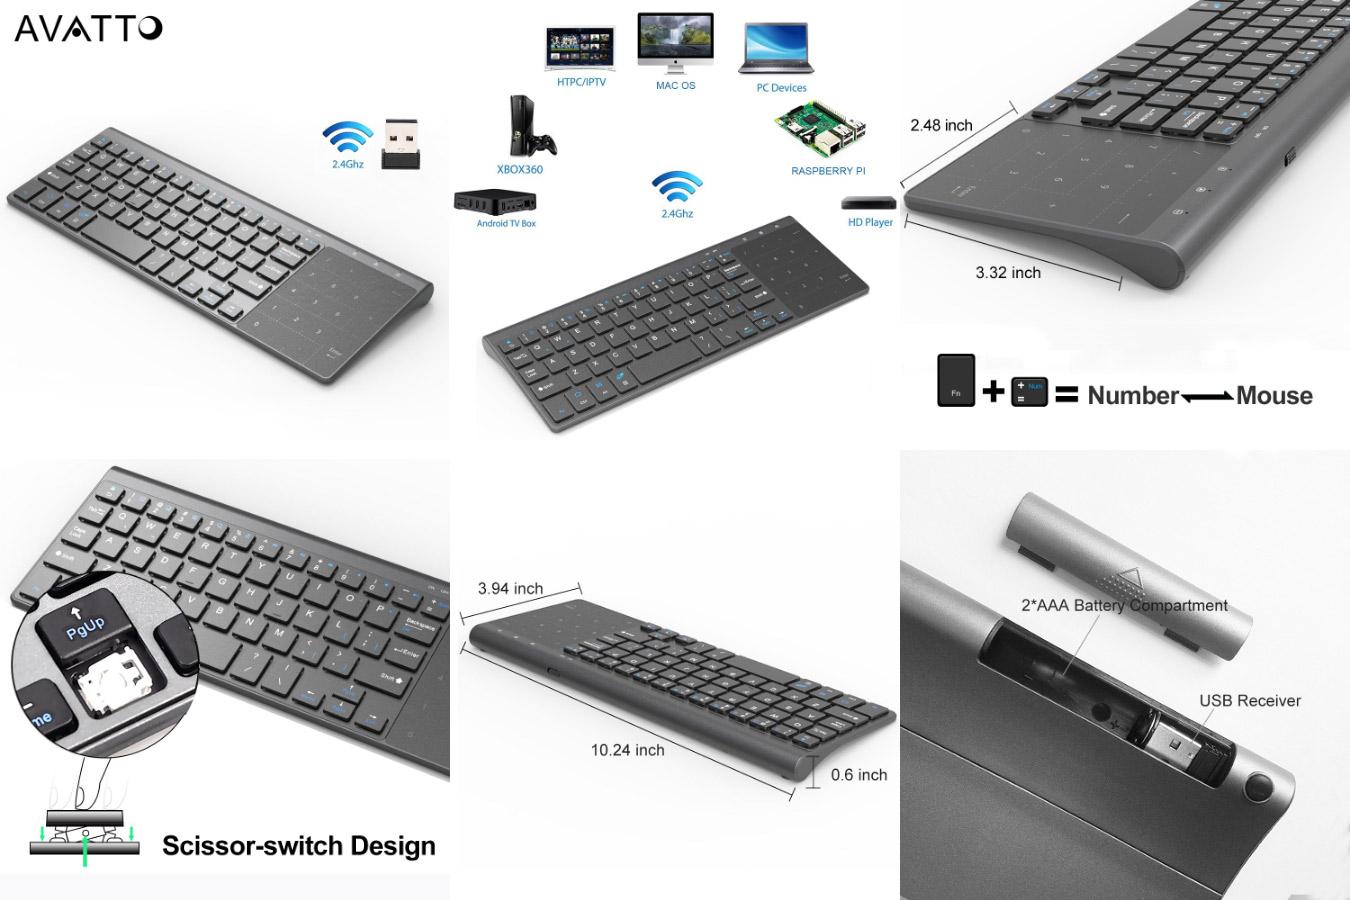 Самая популярная клавиатура с алиэкспресс Avatto T19